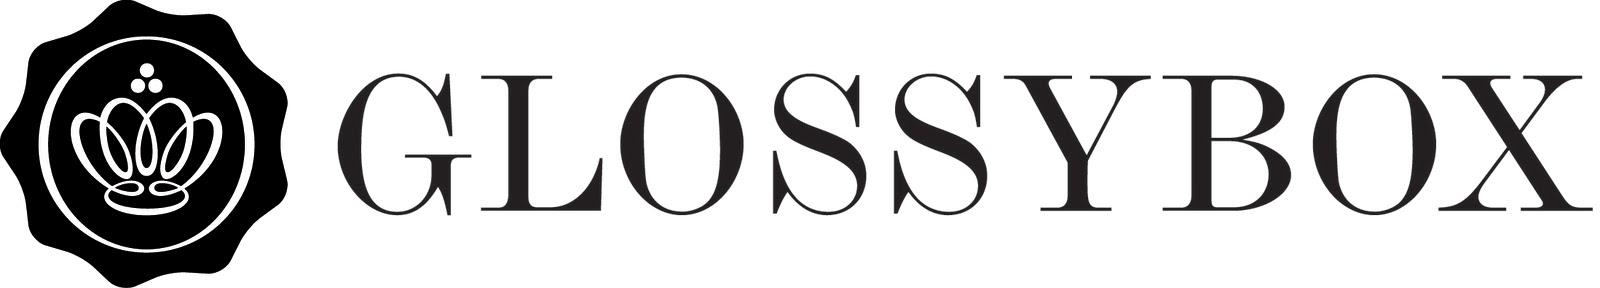 Glossybox logo - Rachael Divers Makeup Artistry